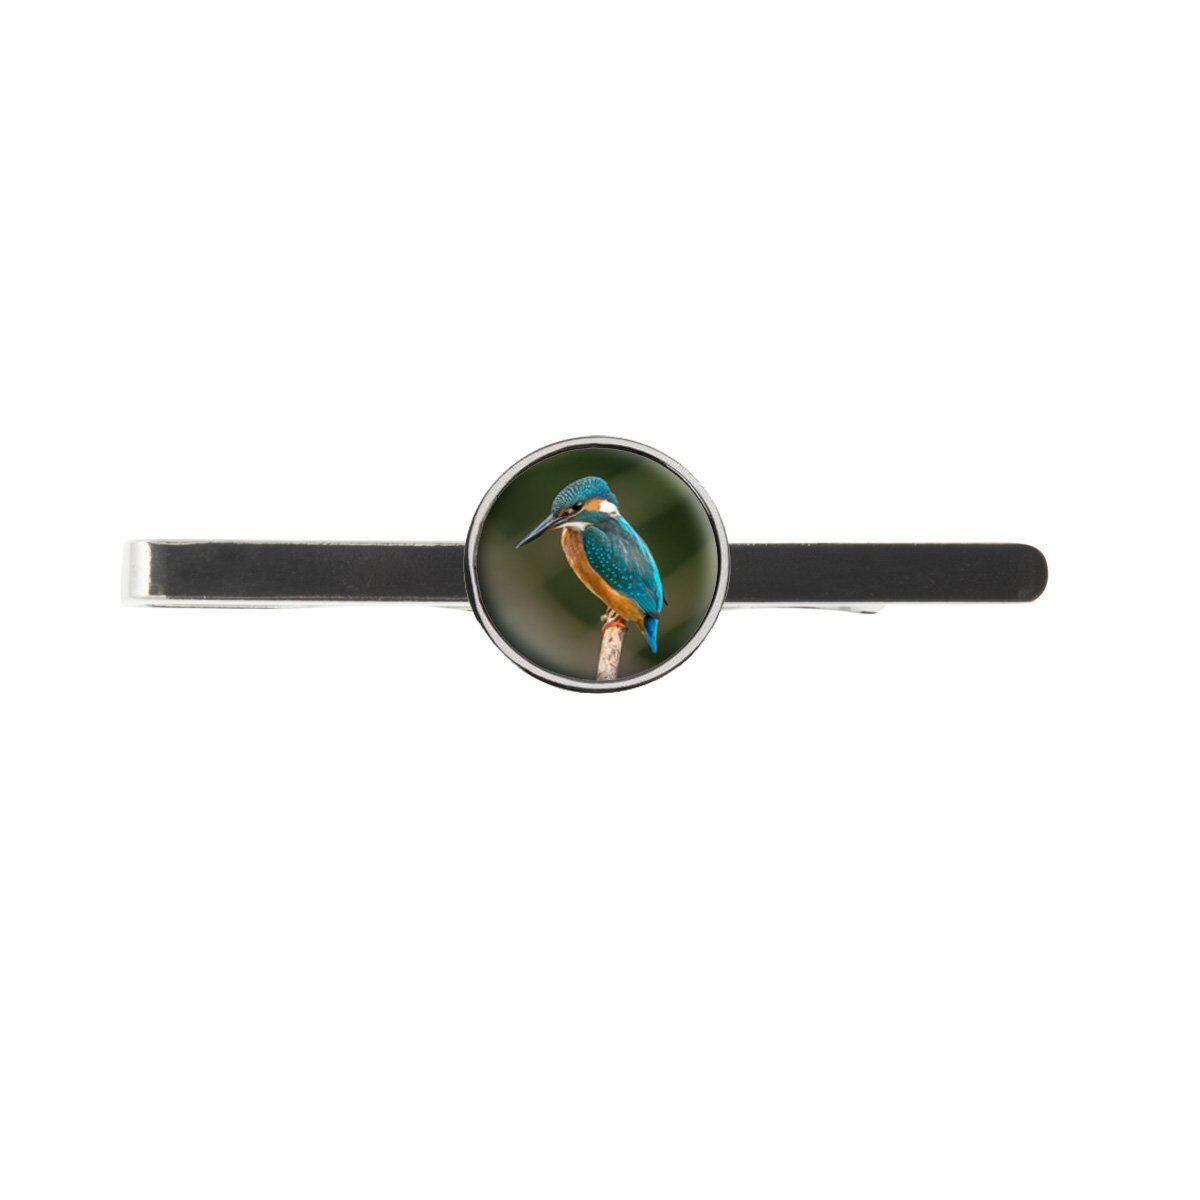 Kingfisher Bird Mens Tie Slide Ideal Birthday Father Day Gift C94